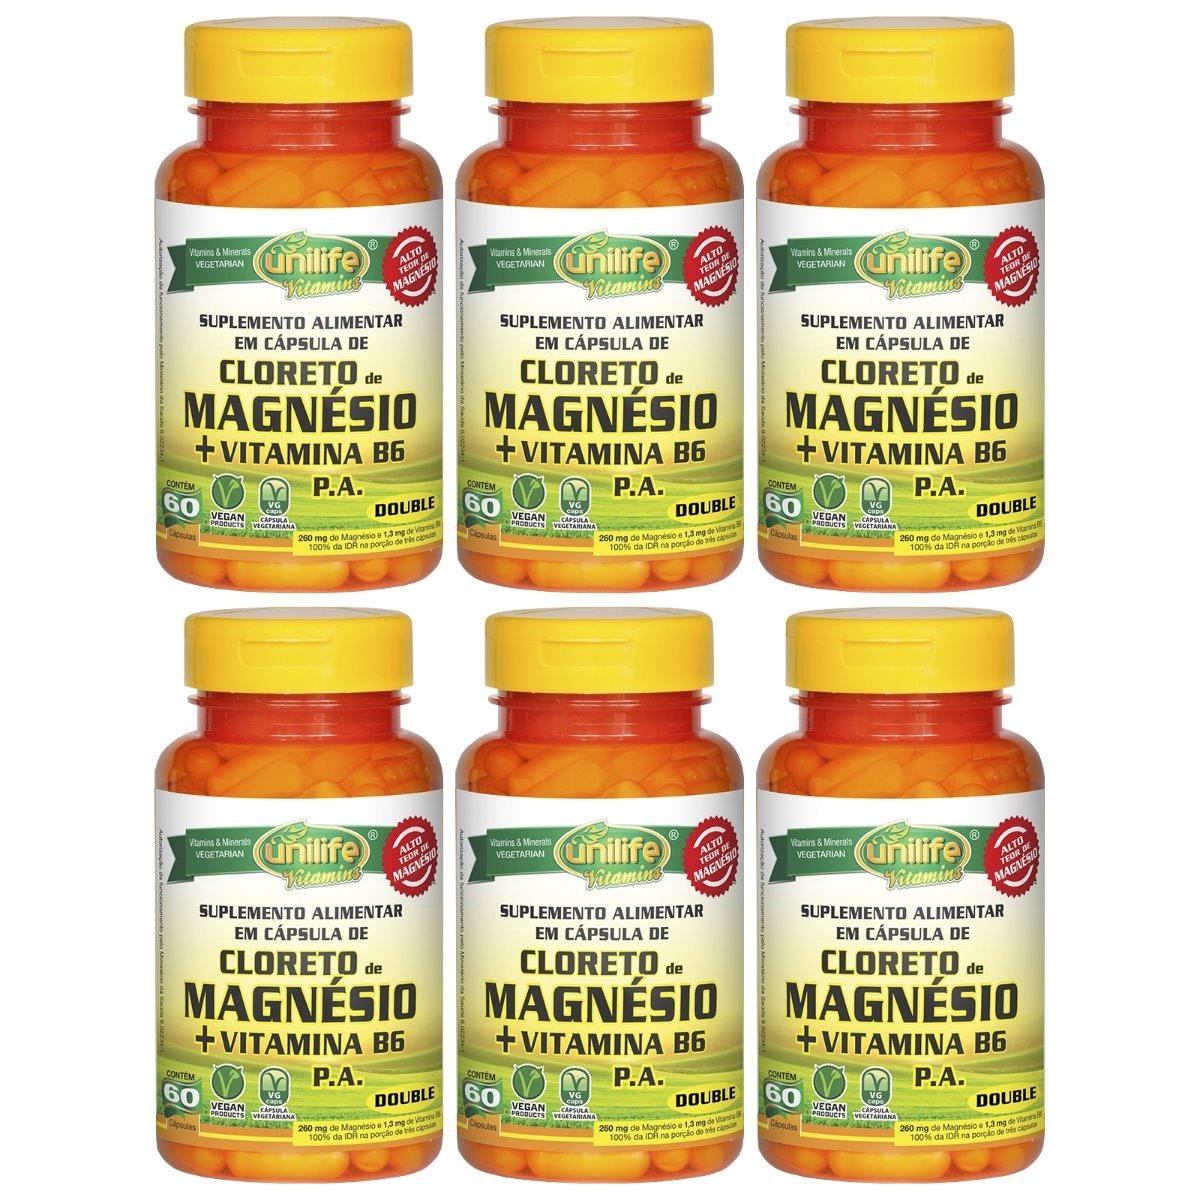 Cloreto De Magnésio P.A. + Vitamina B6 - 60 Cápsulas 800mg Unilife Kit 6 Unidades